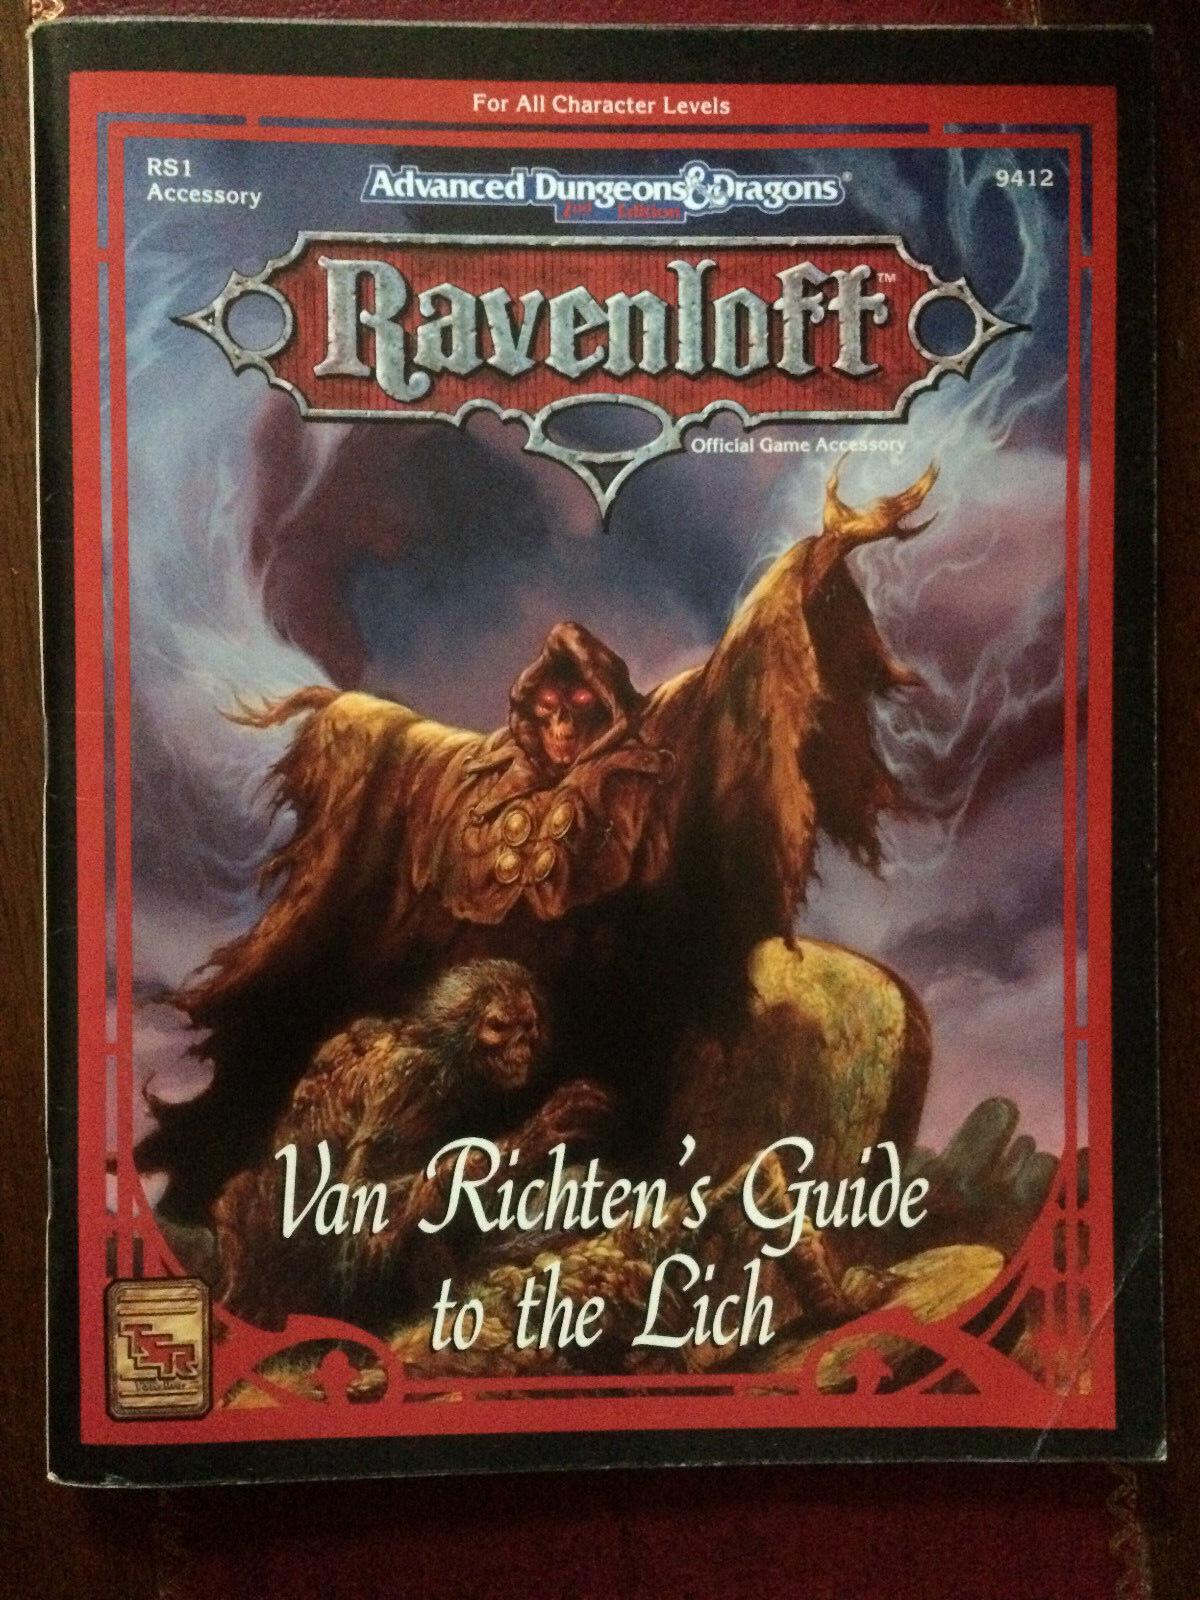 VAN Ravenloft AD&D RICHTENS RS1 9412 LICH THE TO GUIDE